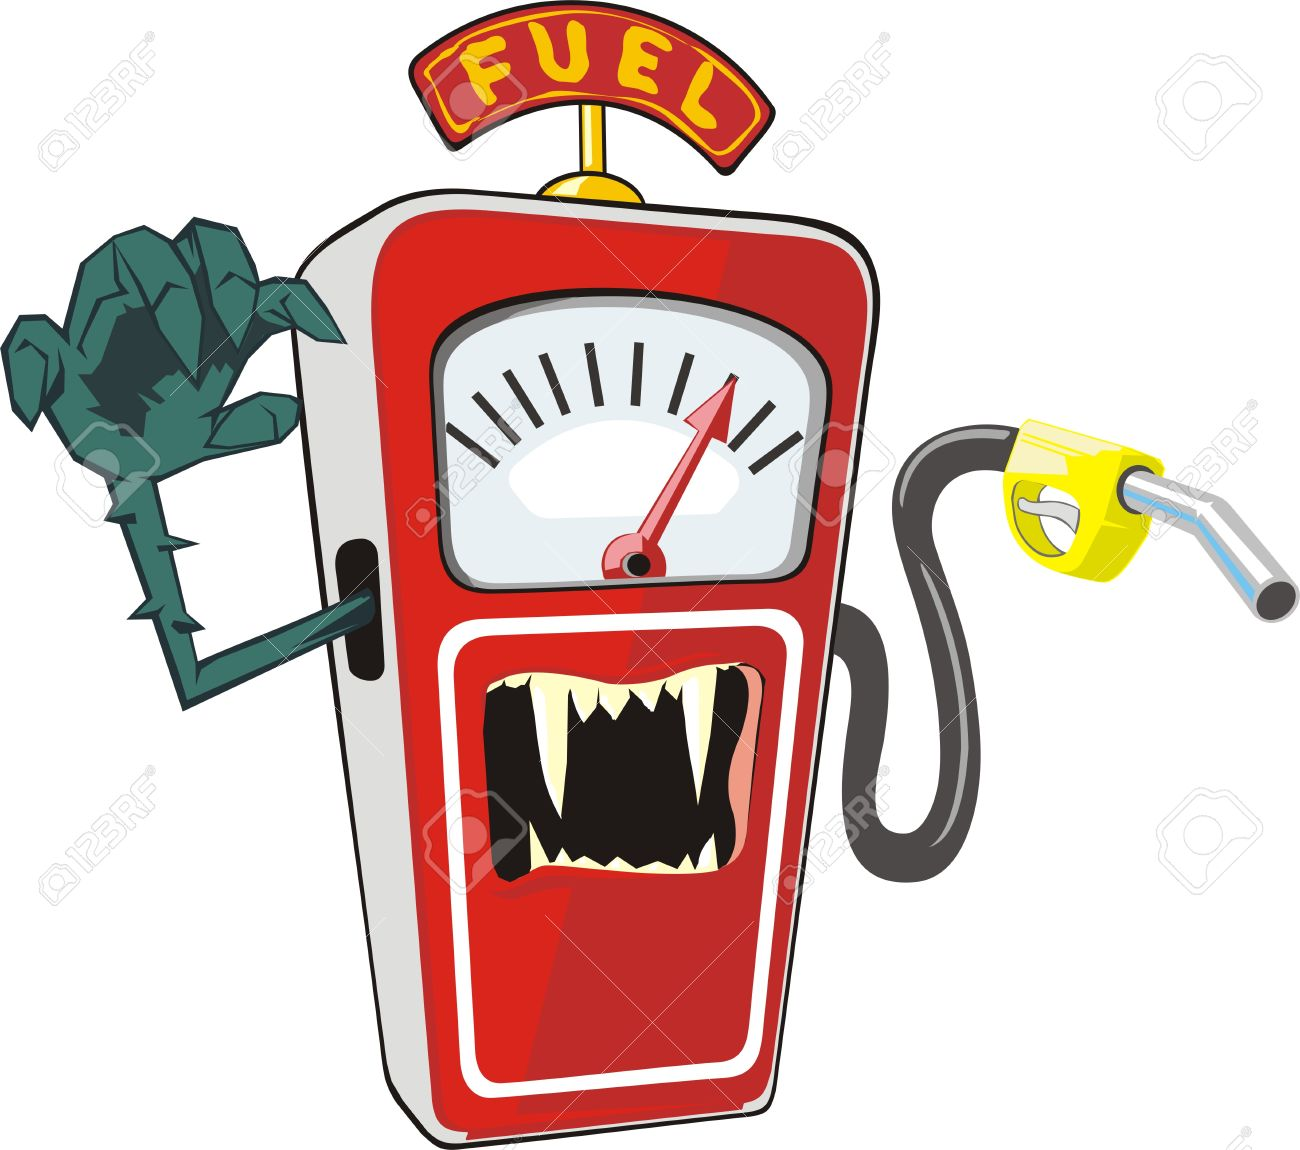 Cartoon Gas Station Clipart.